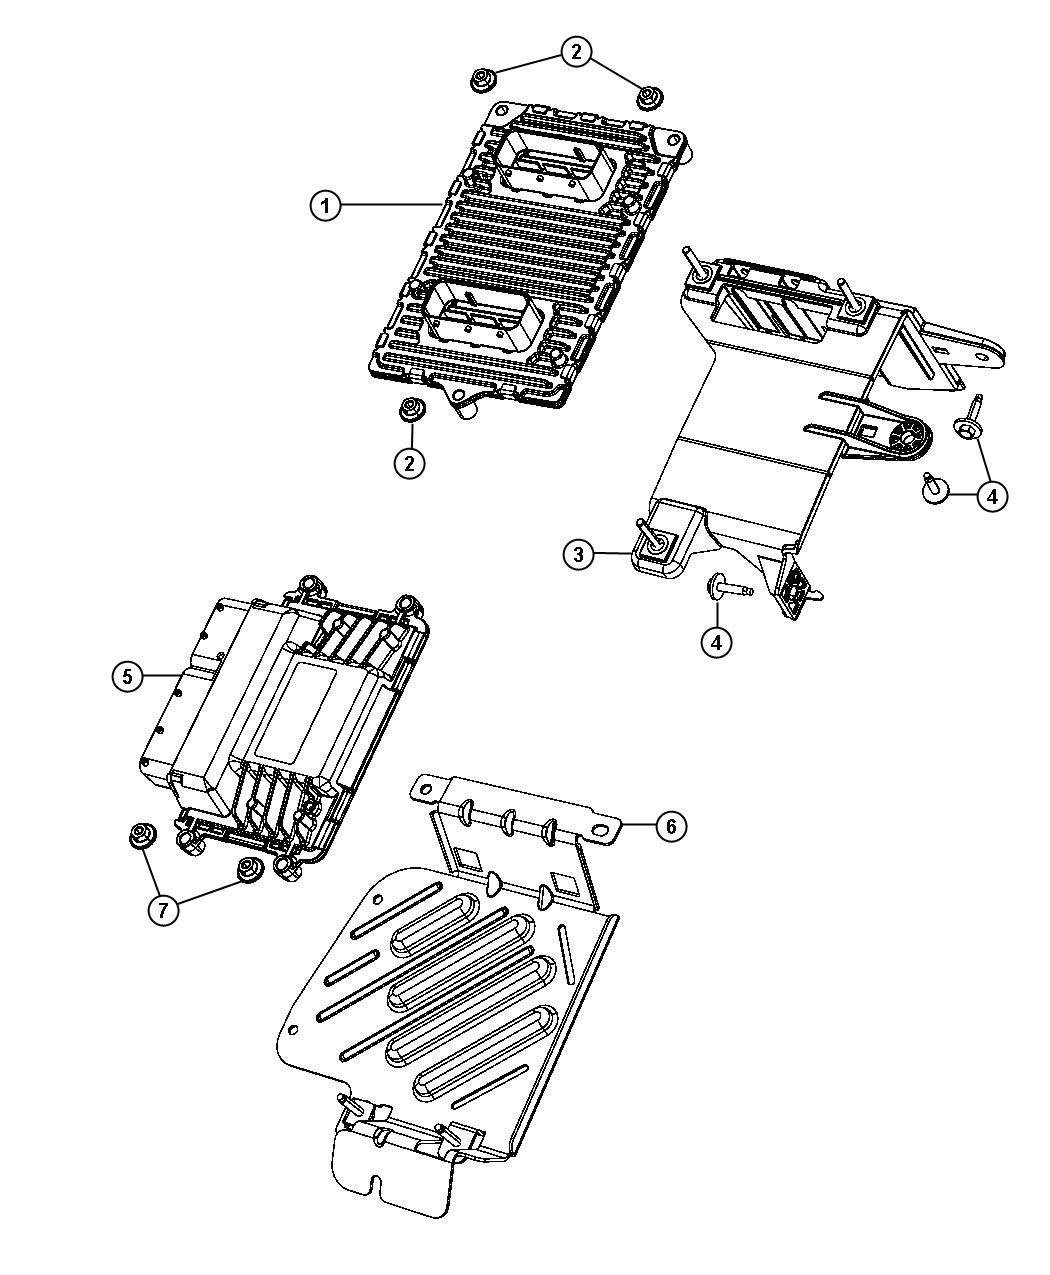 2013 Dodge Dart Bracket. Transmission control module